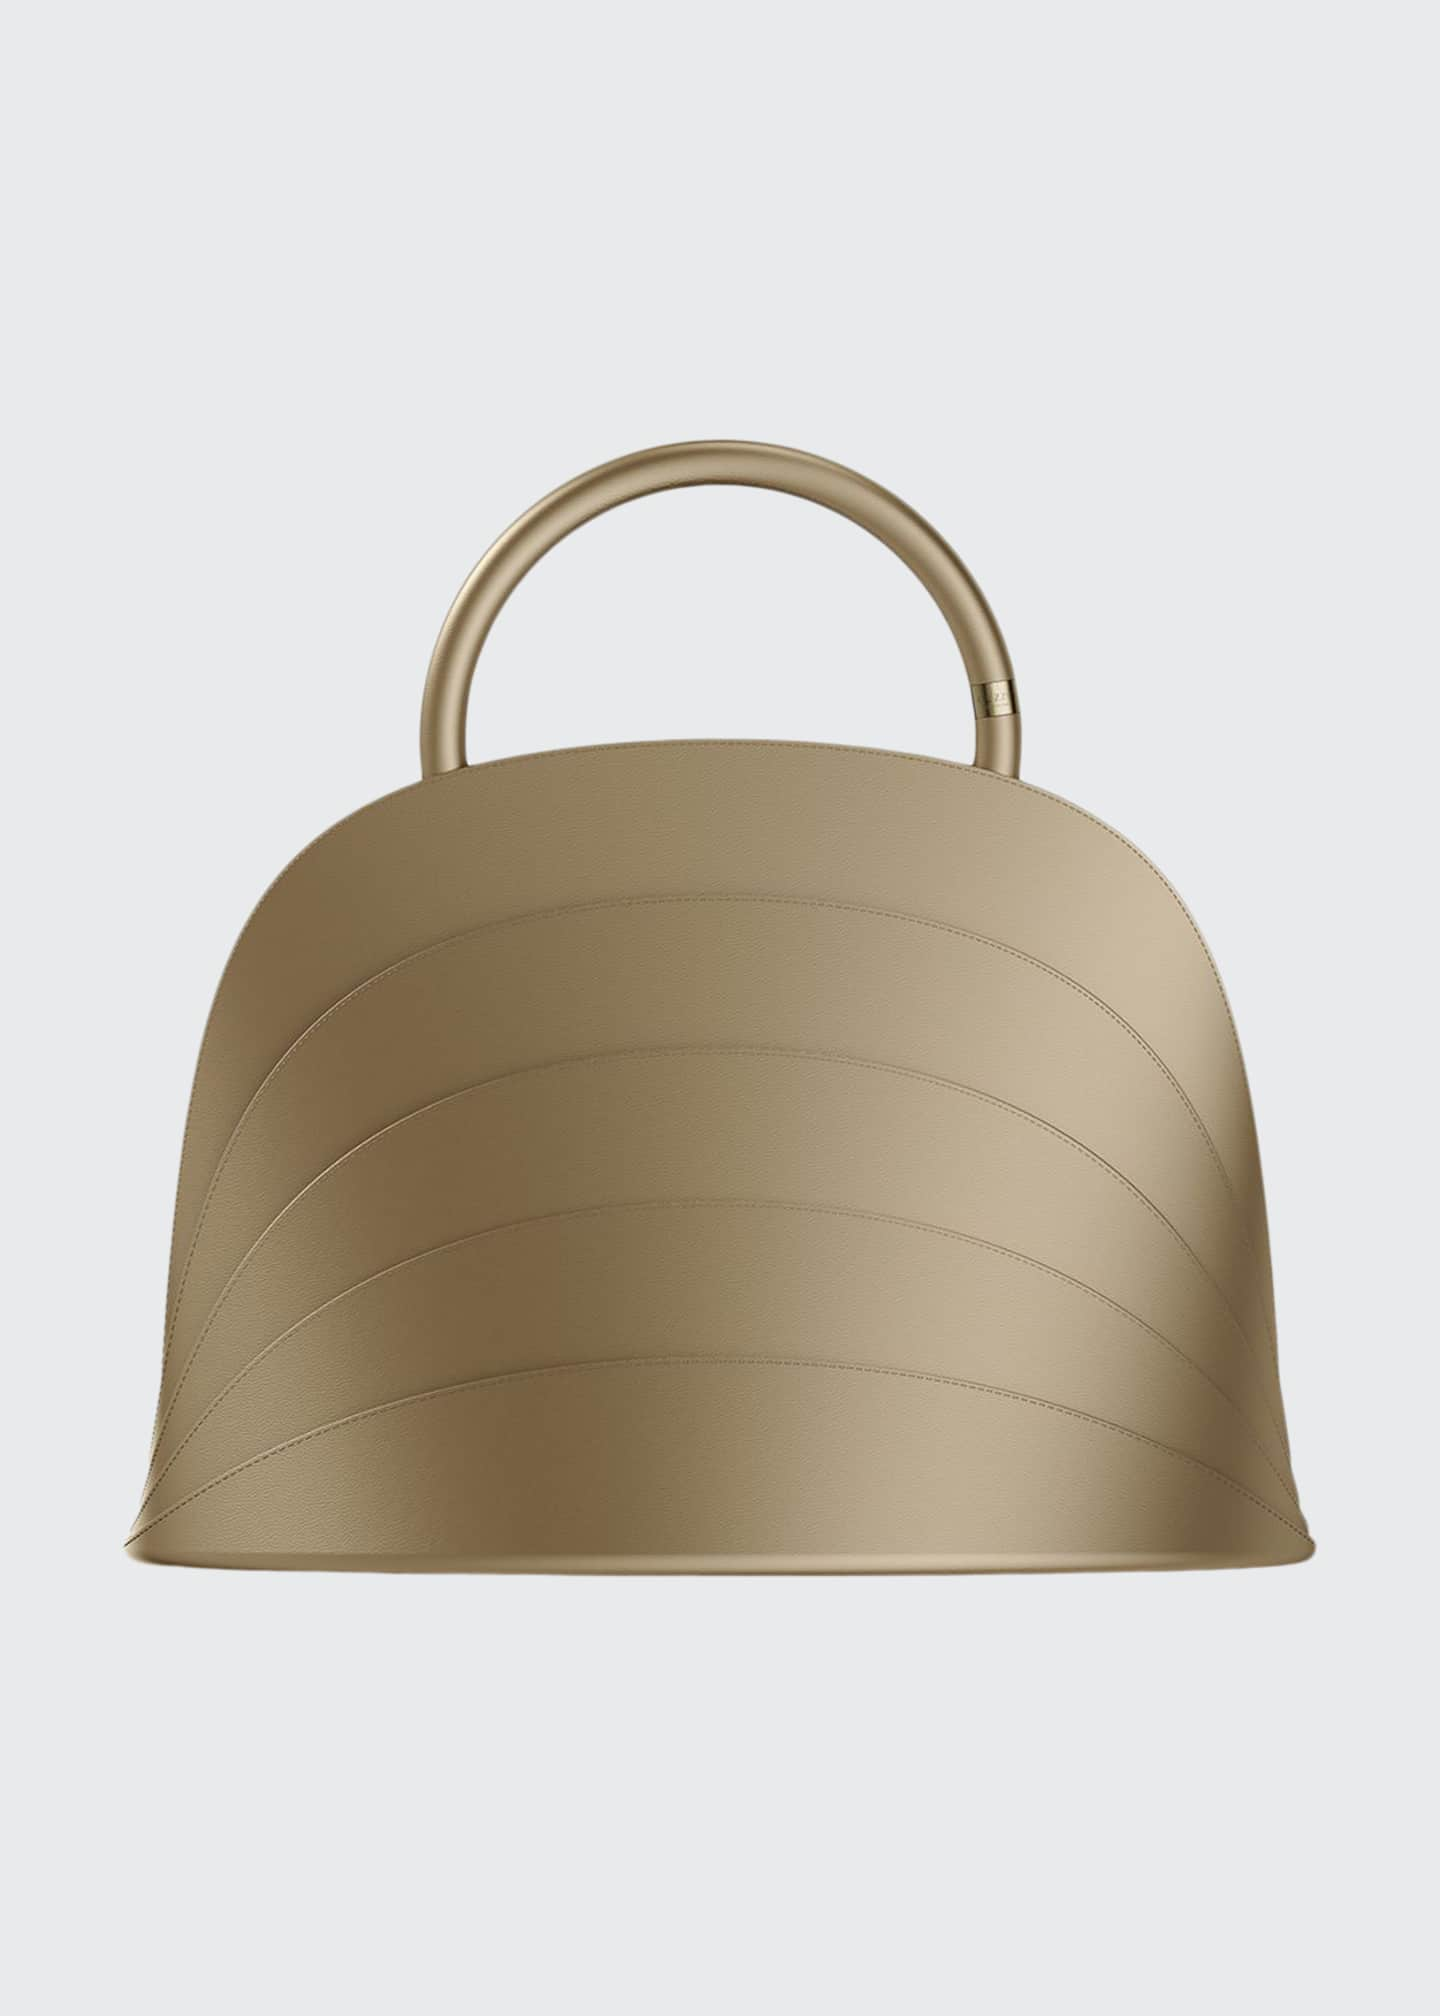 Gabo Guzzo Millefoglie J Layered Top Handle Bag,